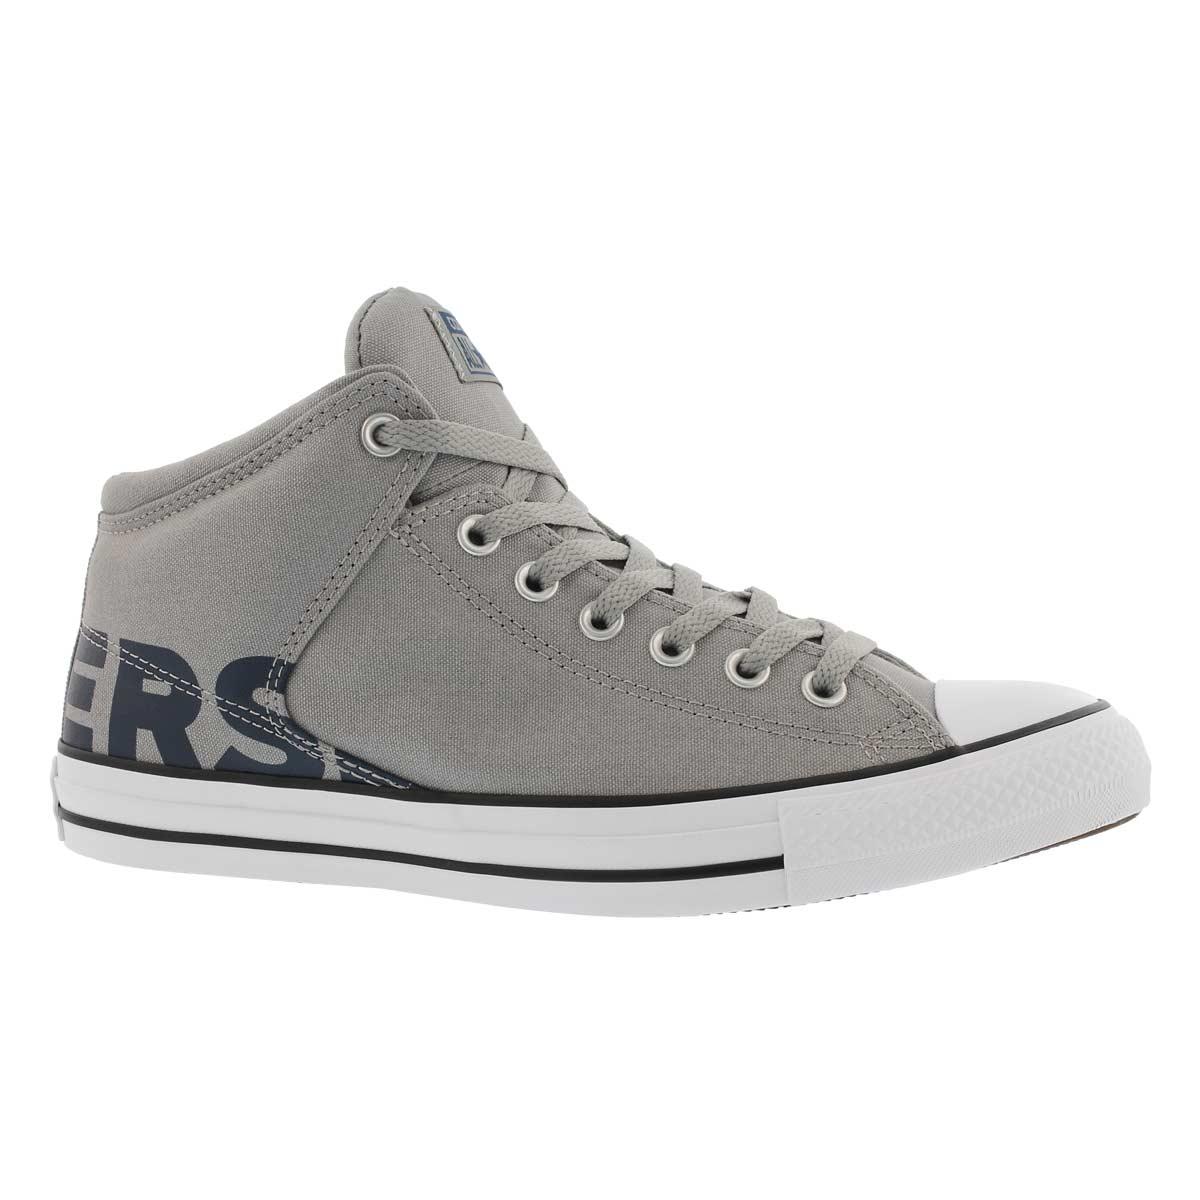 Men's CT ALL STAR HIGH STREET WORDMARK sneakers